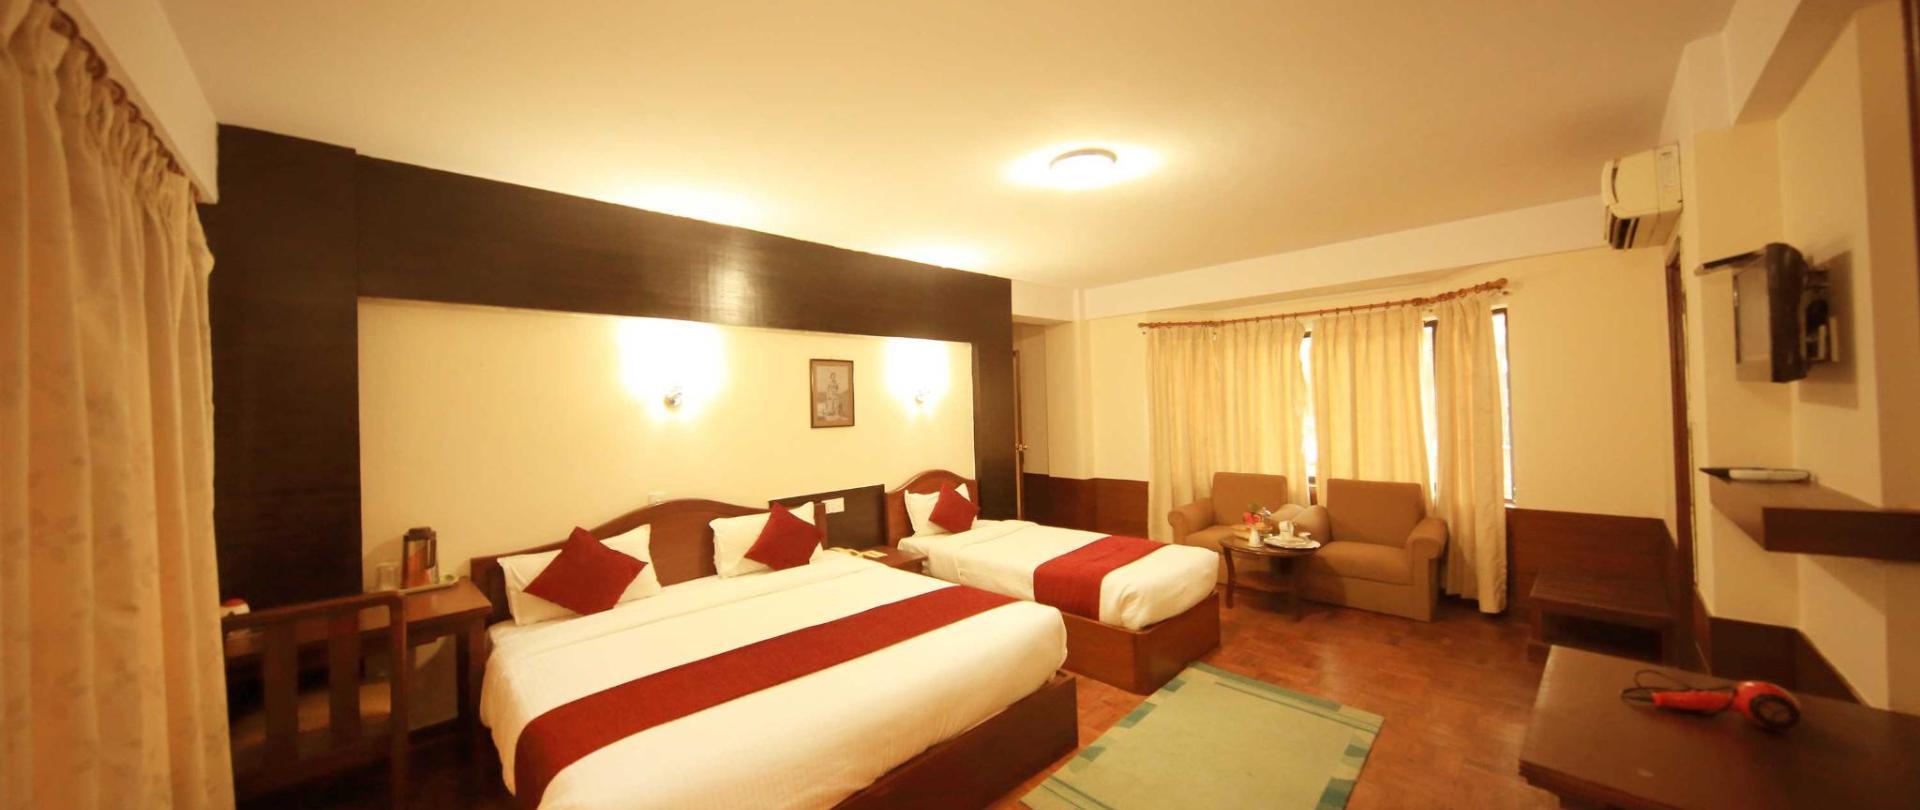 Samsara Resort & Hotel